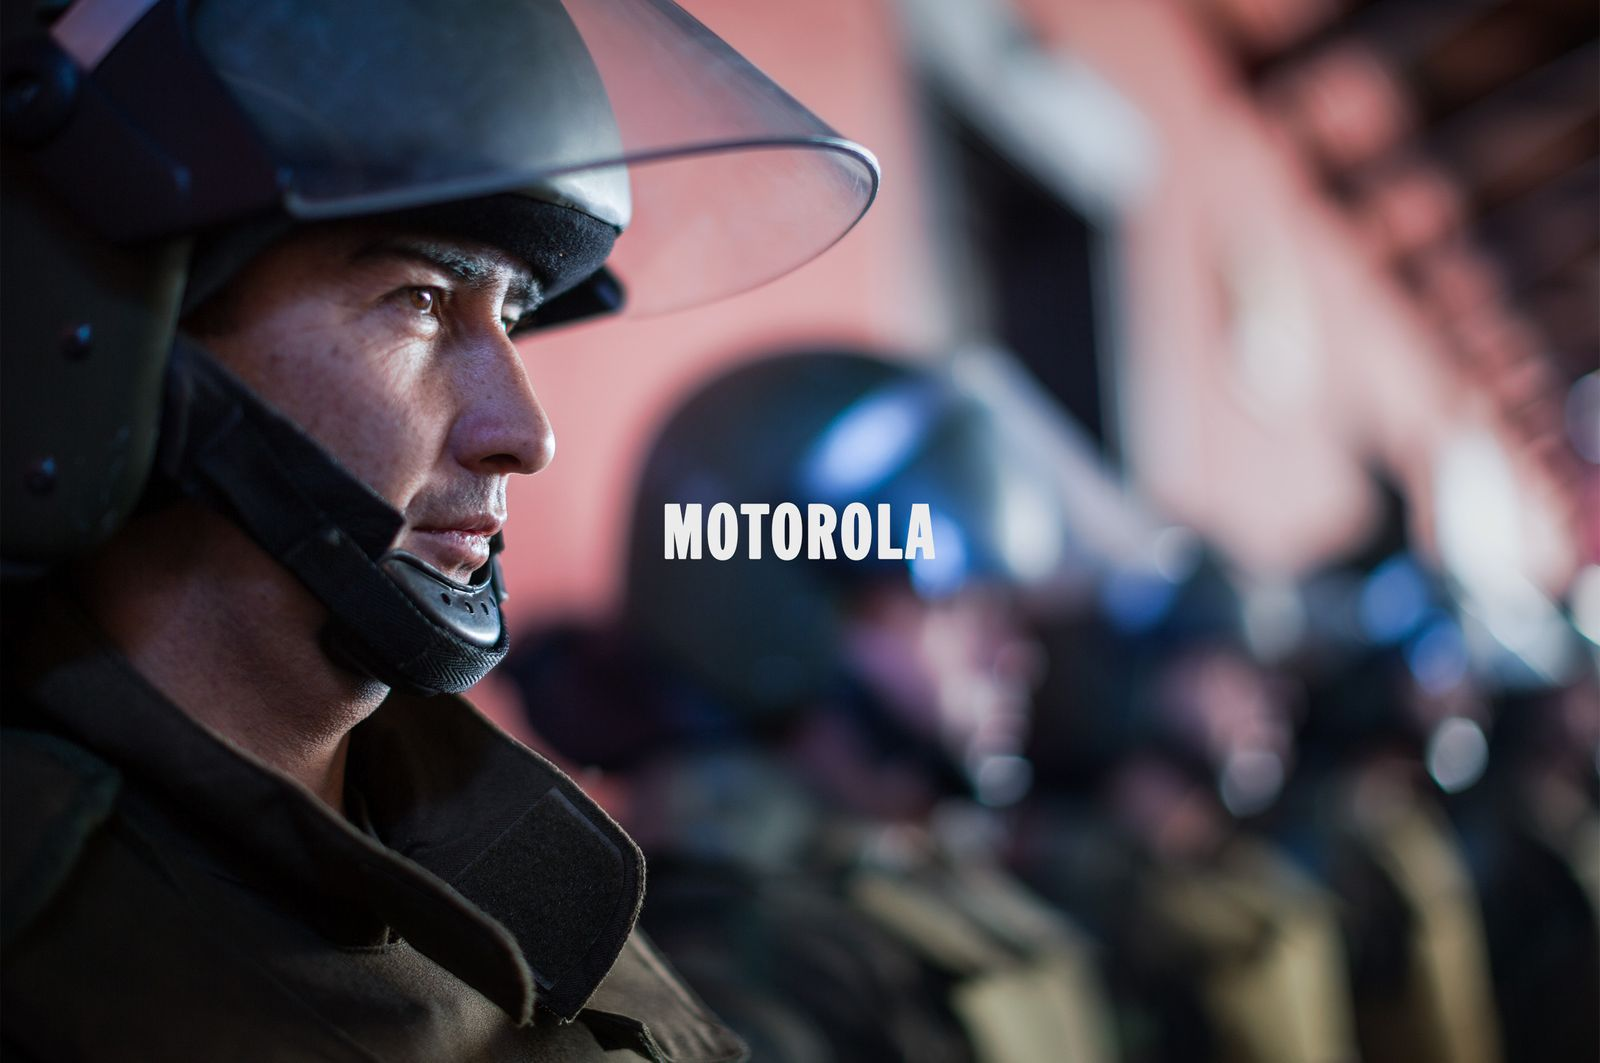 MOTOROLA_2.jpg